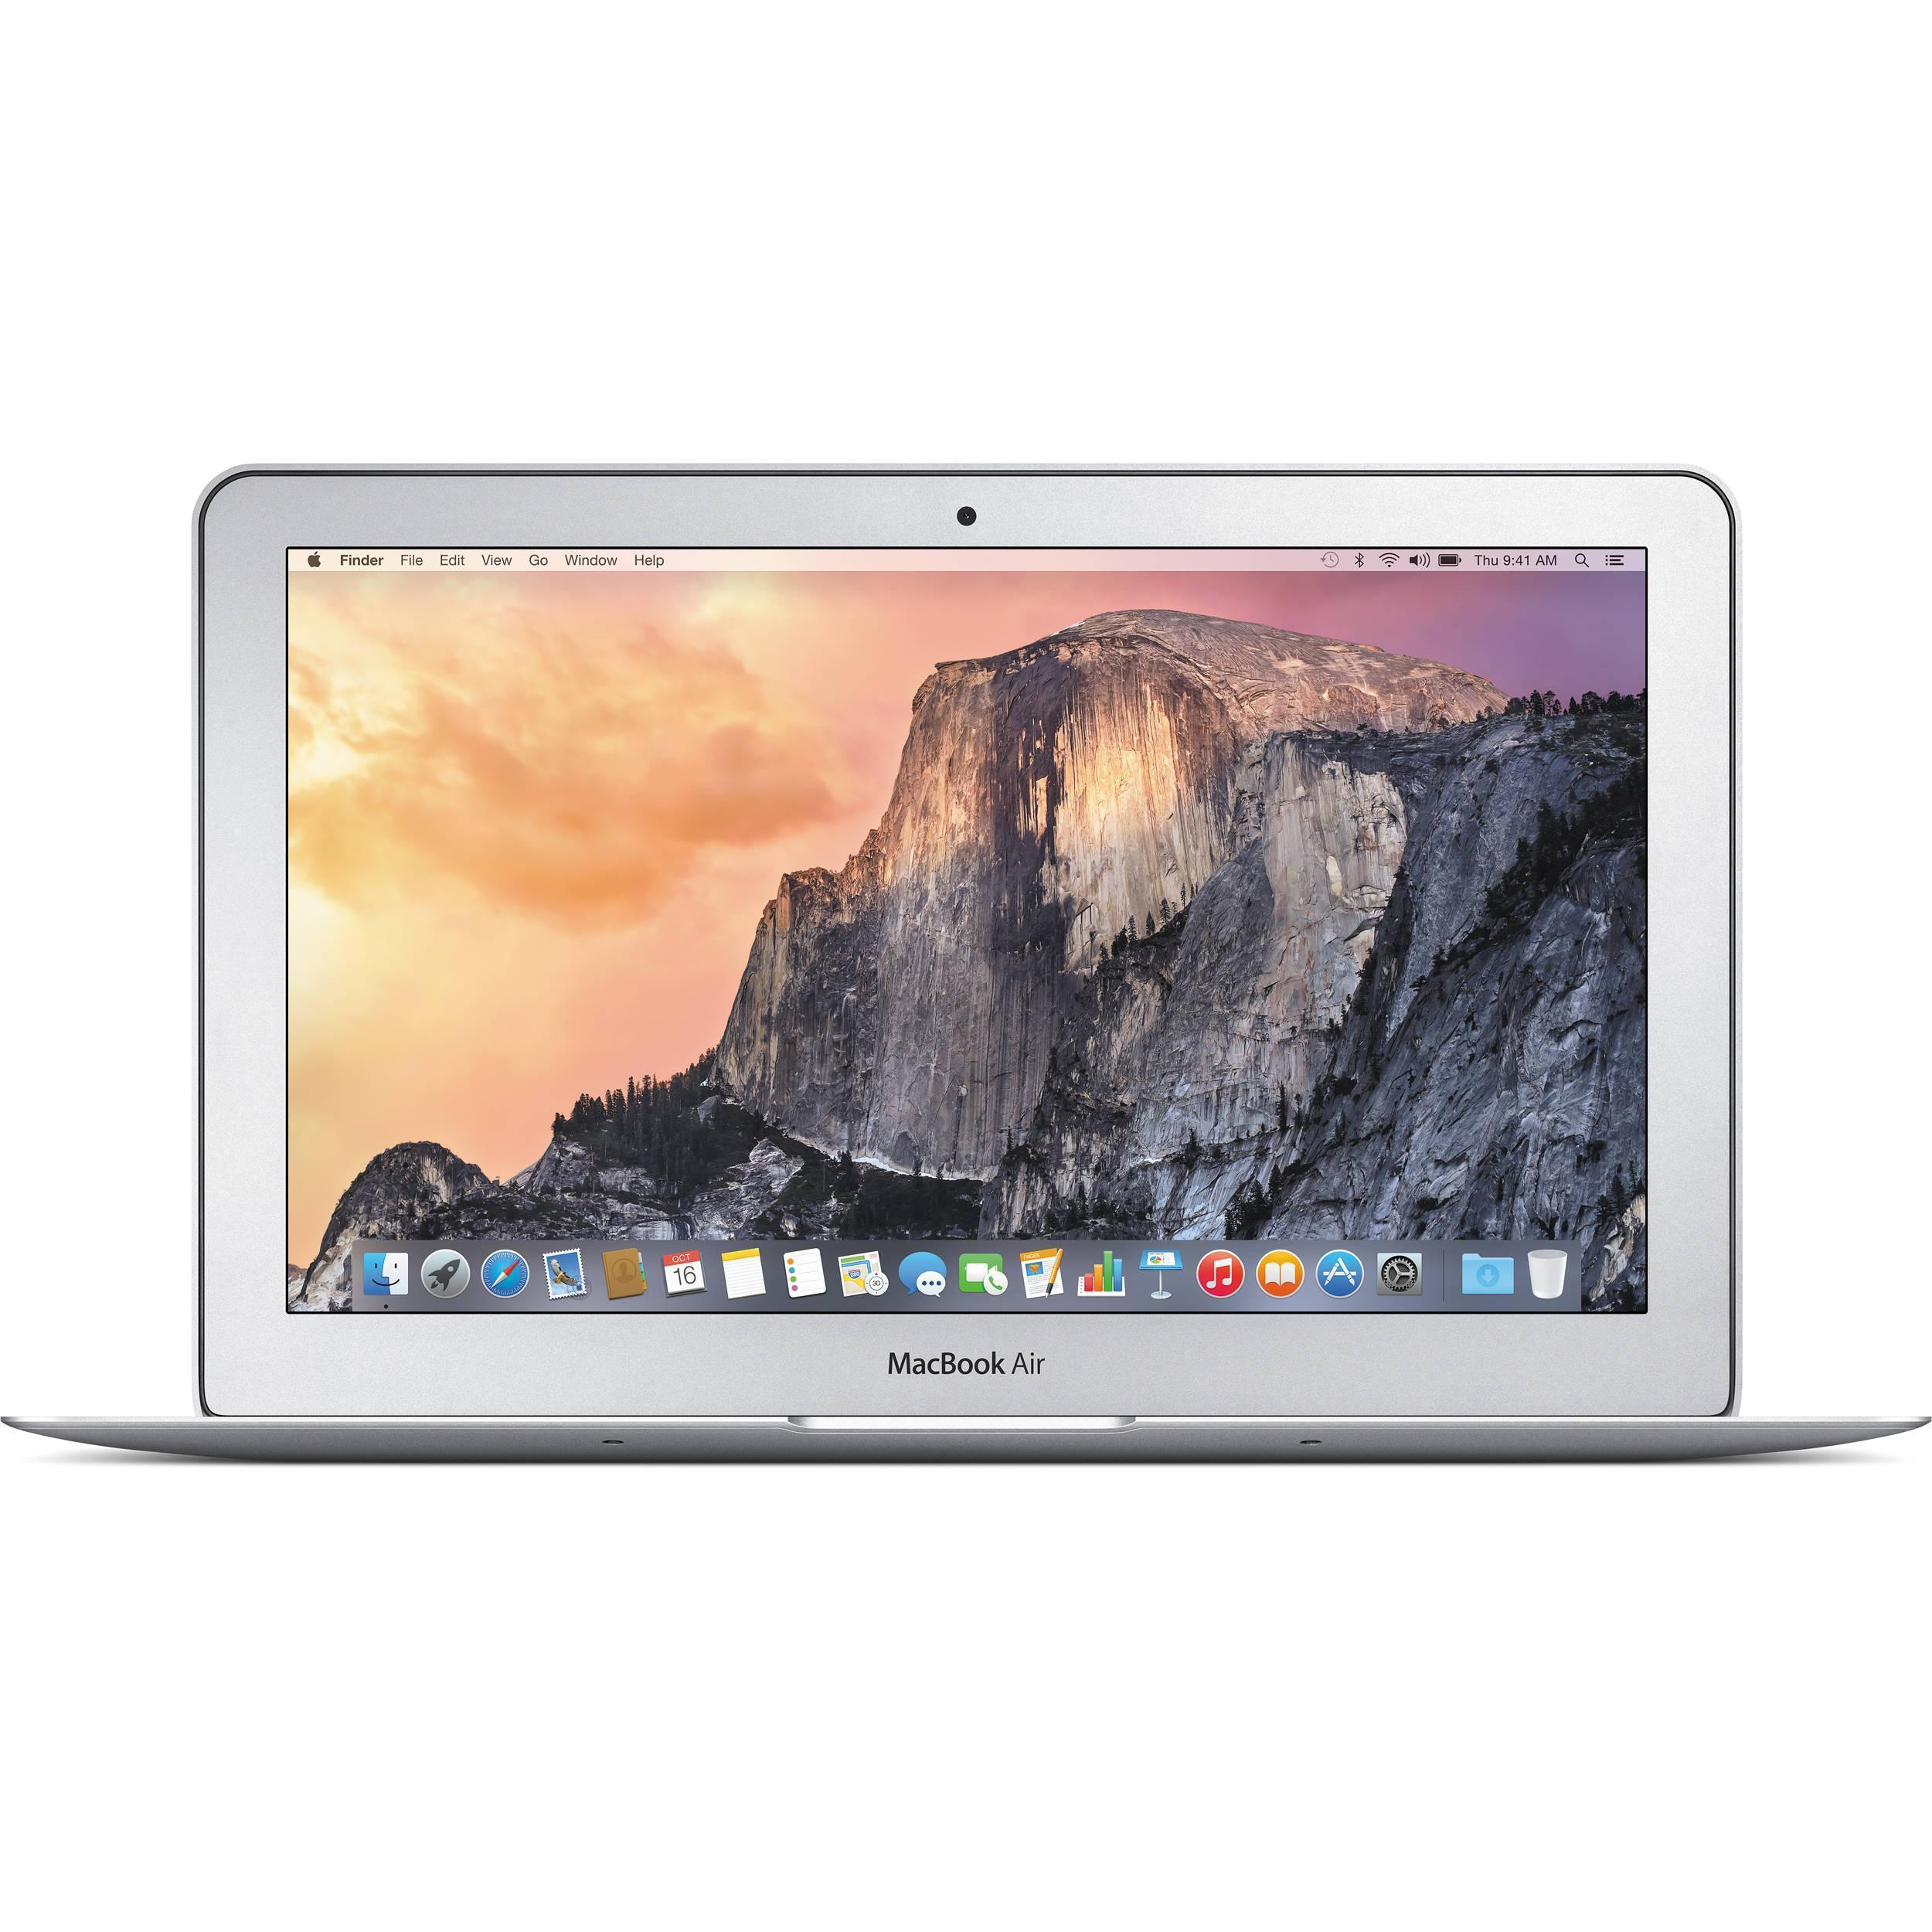 MacBook Air 11,6-tum (2012) - Core i5 - 4GB - SSD 512 GB QWERTY - Nederländska